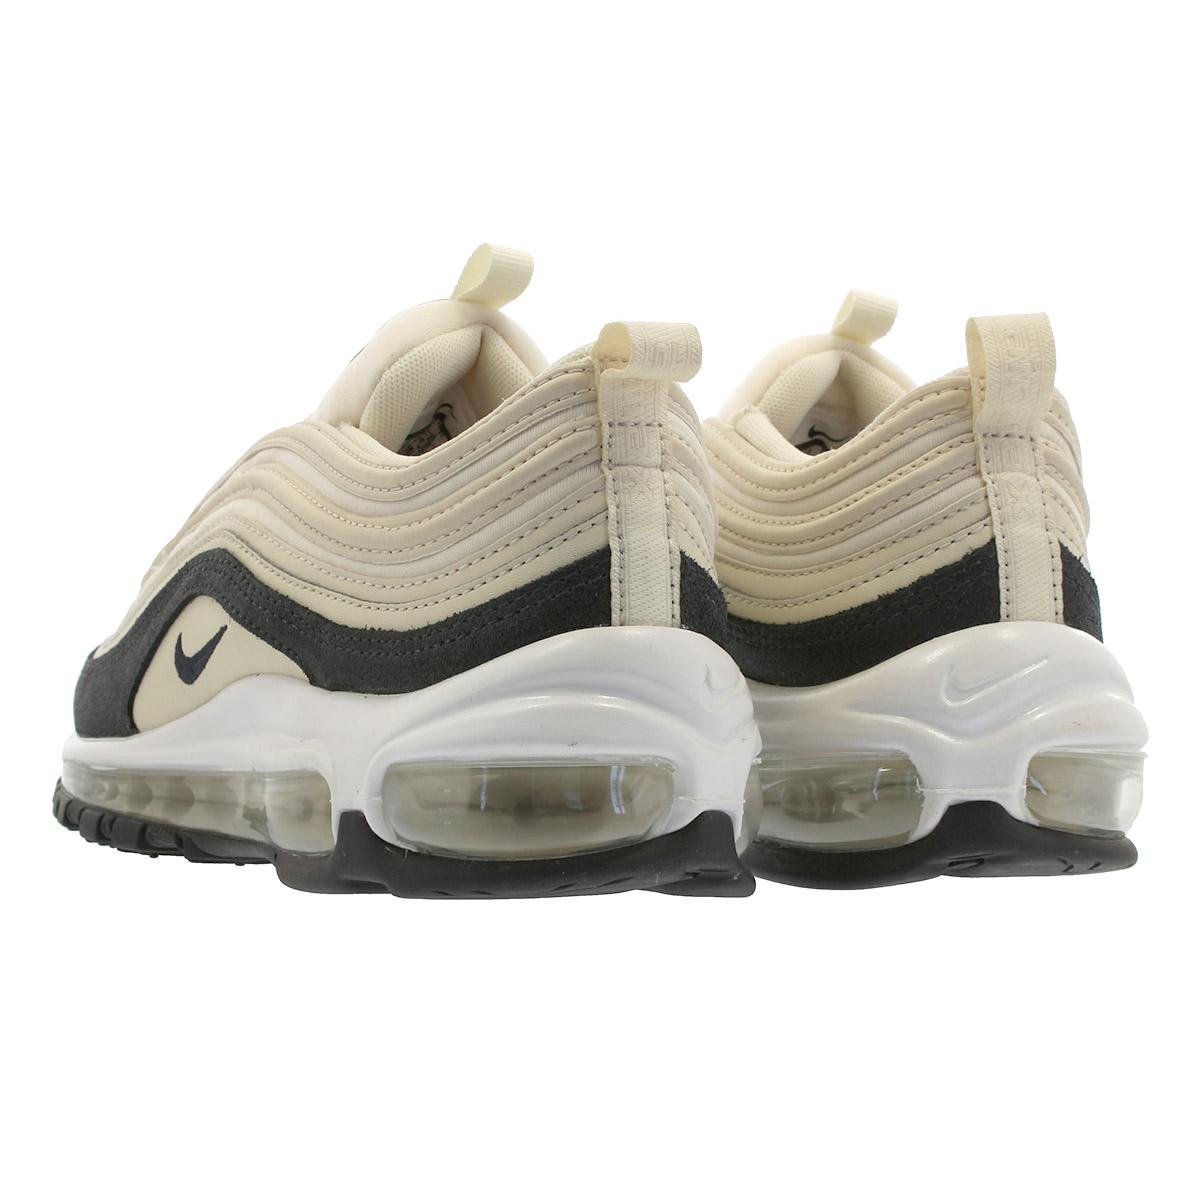 de07dad4cb ... NIKE WMNS AIR MAX 97 PREMIUM Nike women Air Max 97 premium LIGHT CREAM/OIL  ...